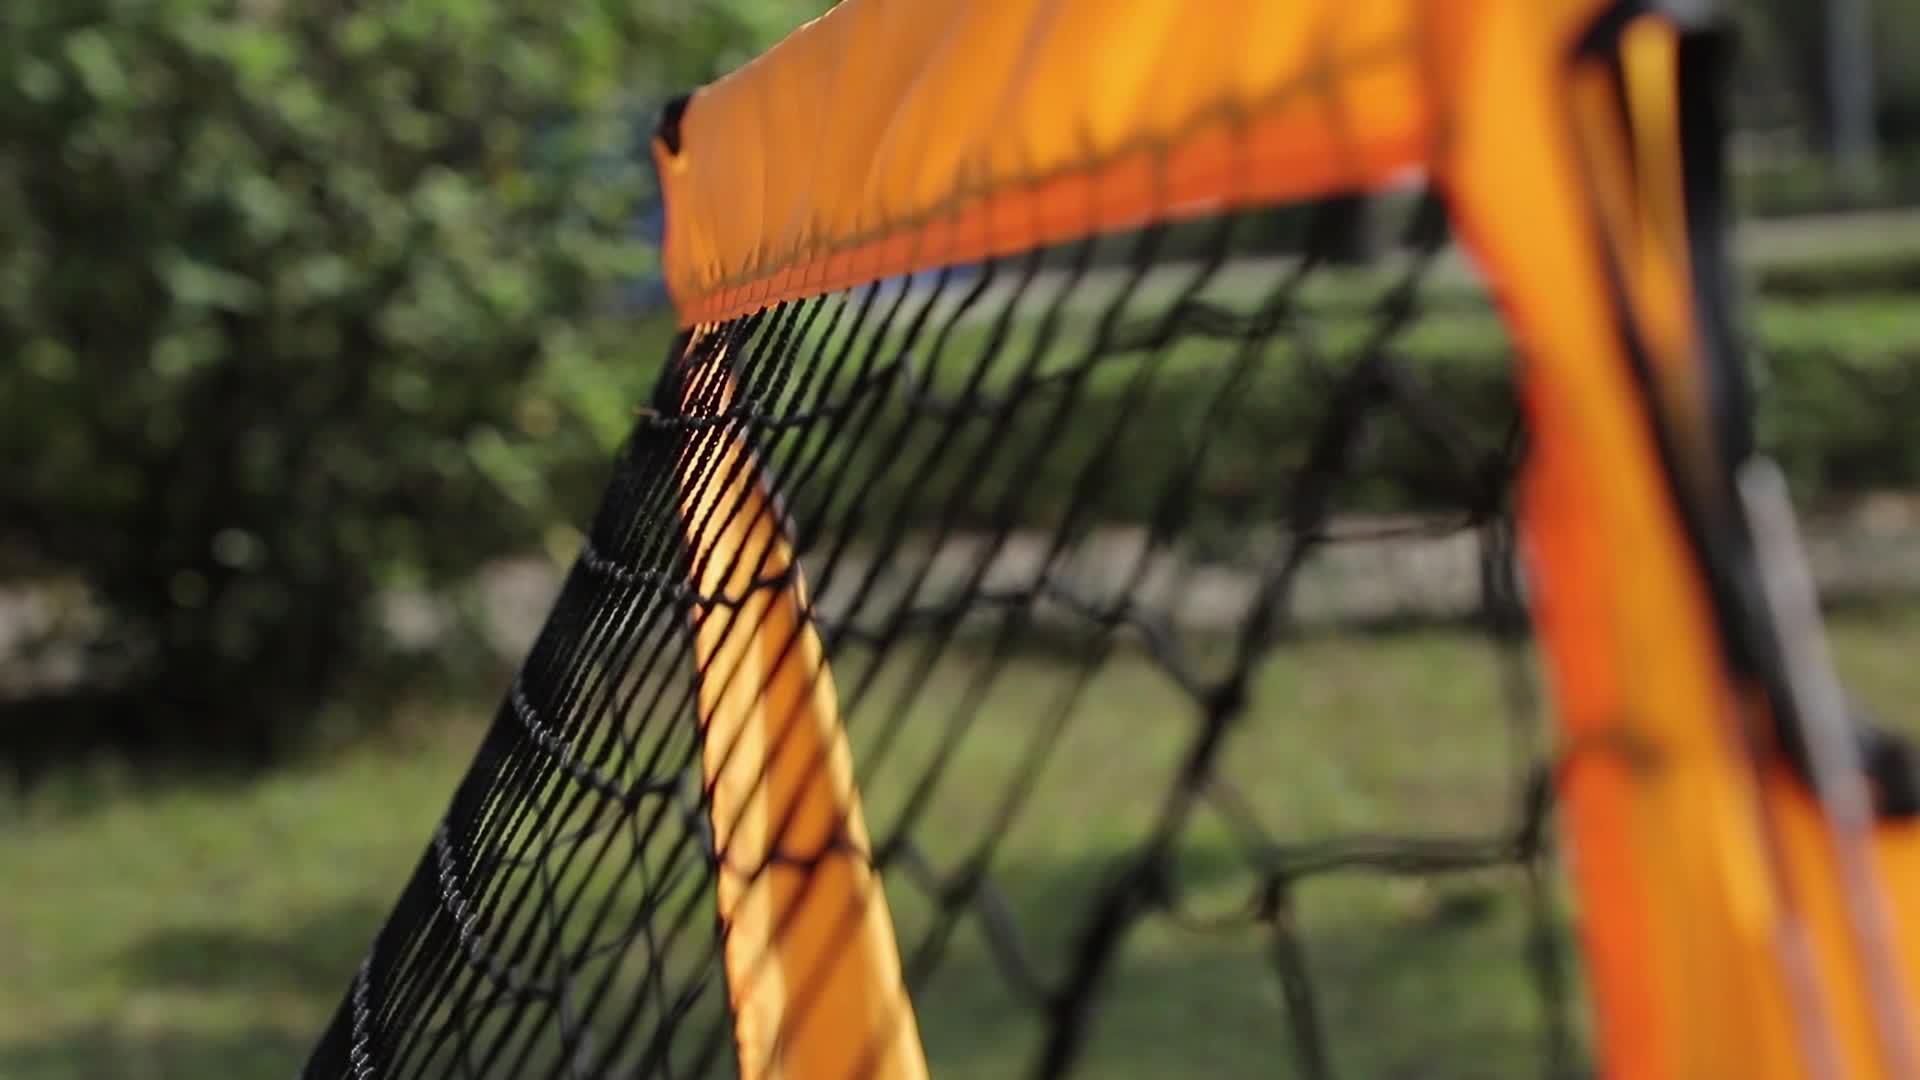 Barato Portátil Esporte Floorball Rebounder Dobrável Net 4FT Trem Futebol Gol De Futebol